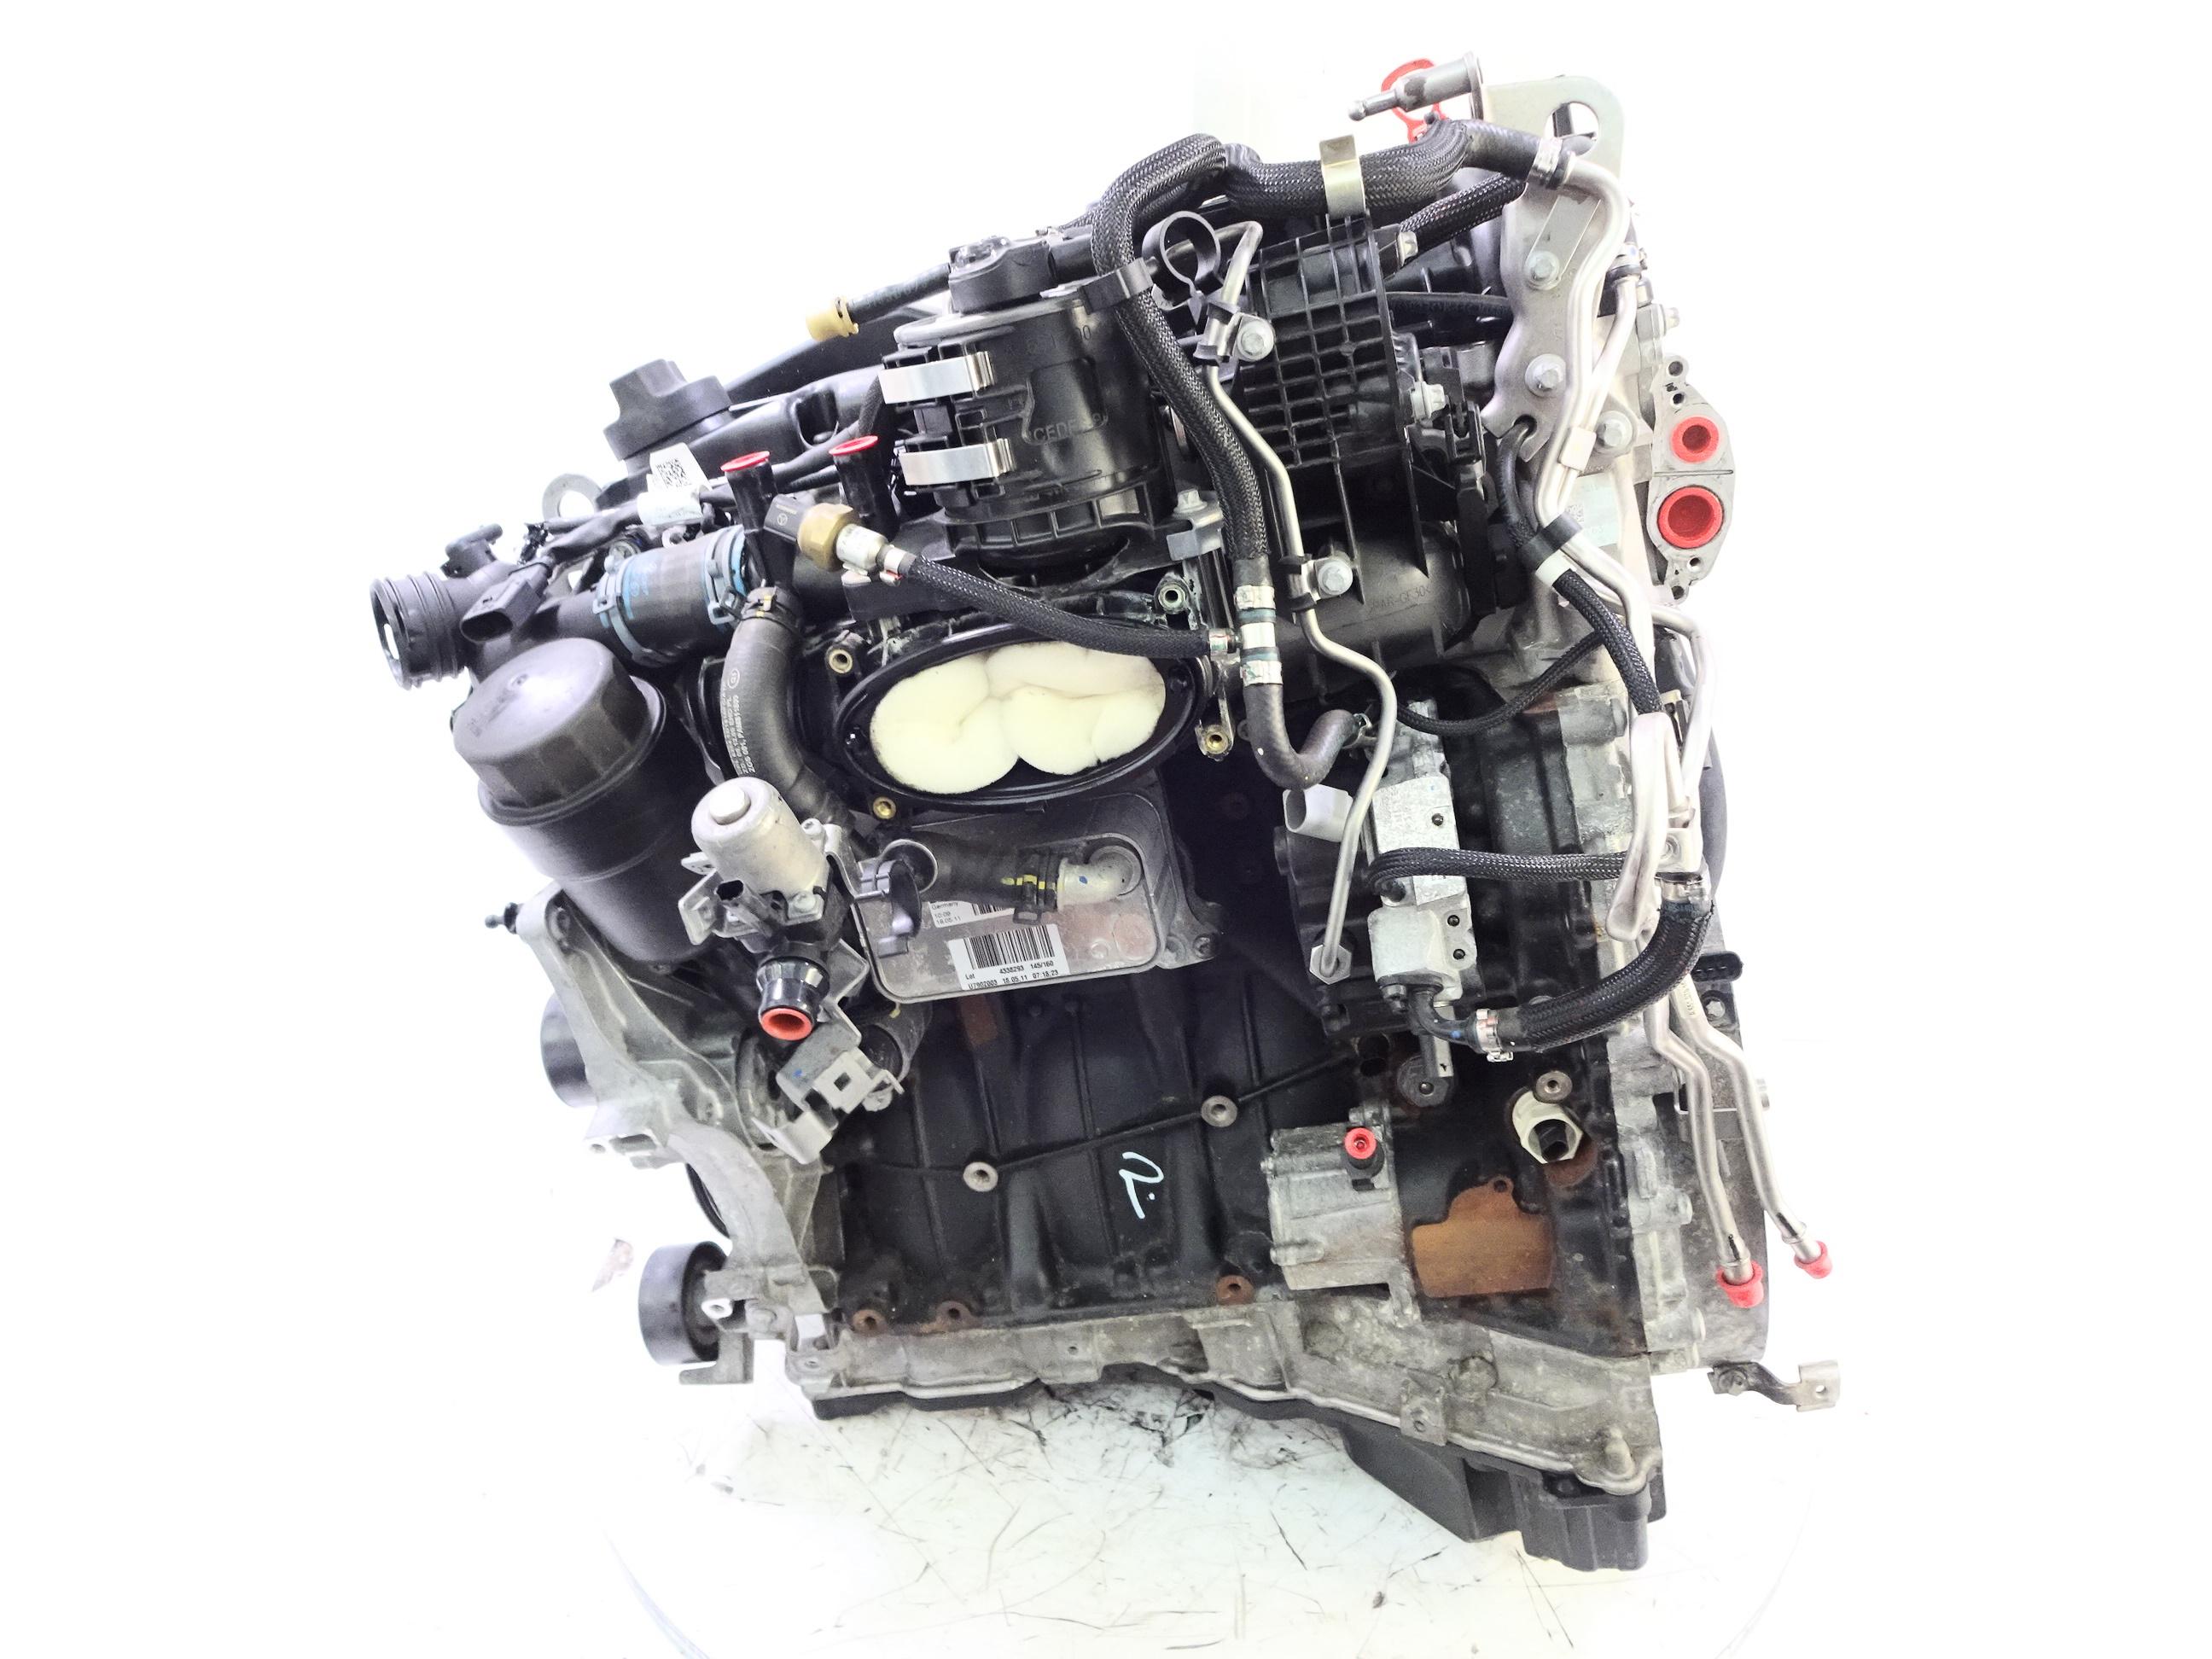 Motor 2012 Mercedes-Benz C-Klasse W204 E-Klasse C207 2,2 CDI 651.911 OM651